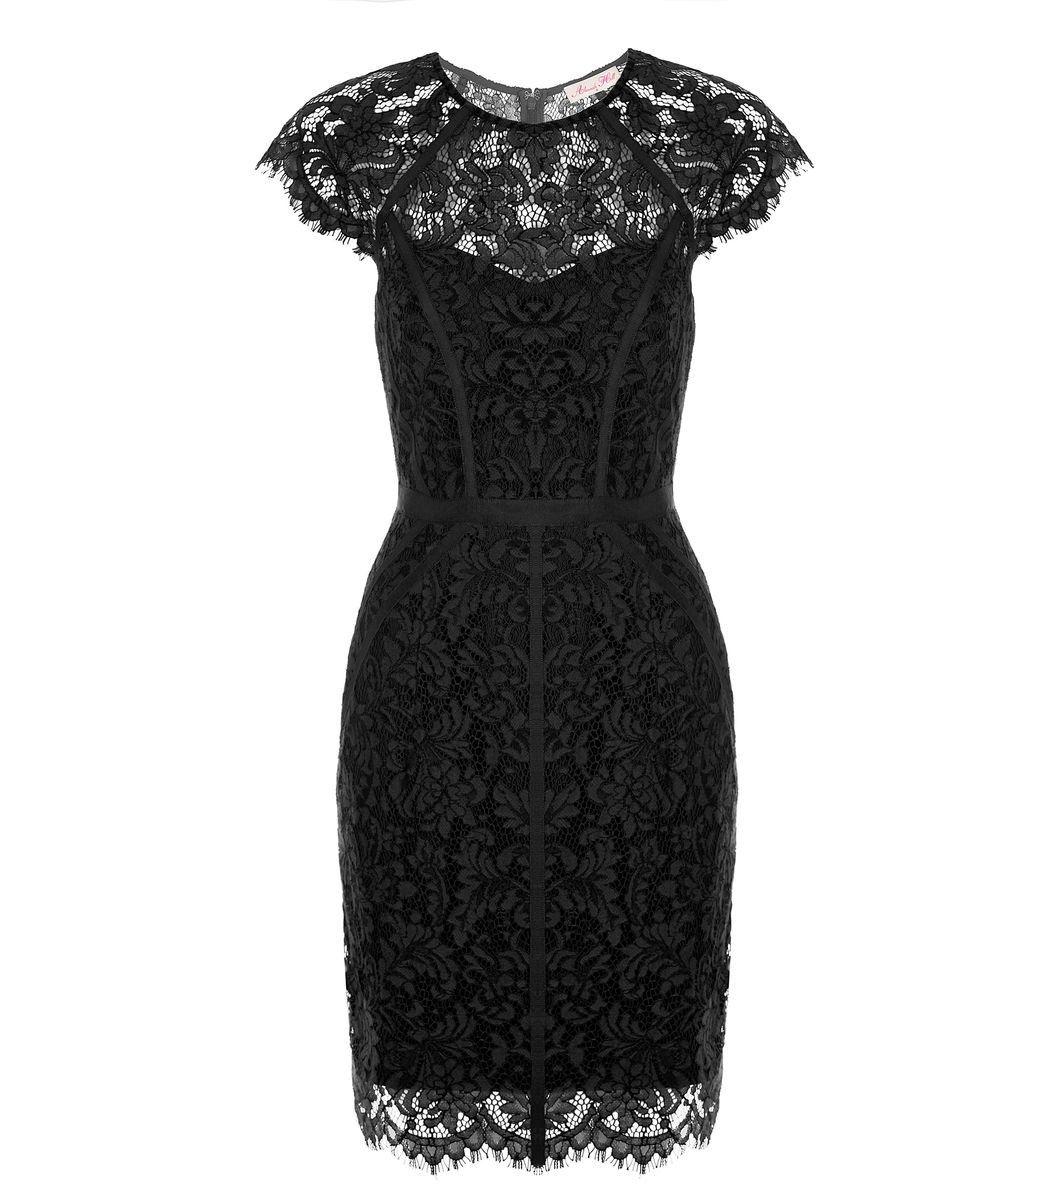 Alannah Hill - I Read Your Diary Dress